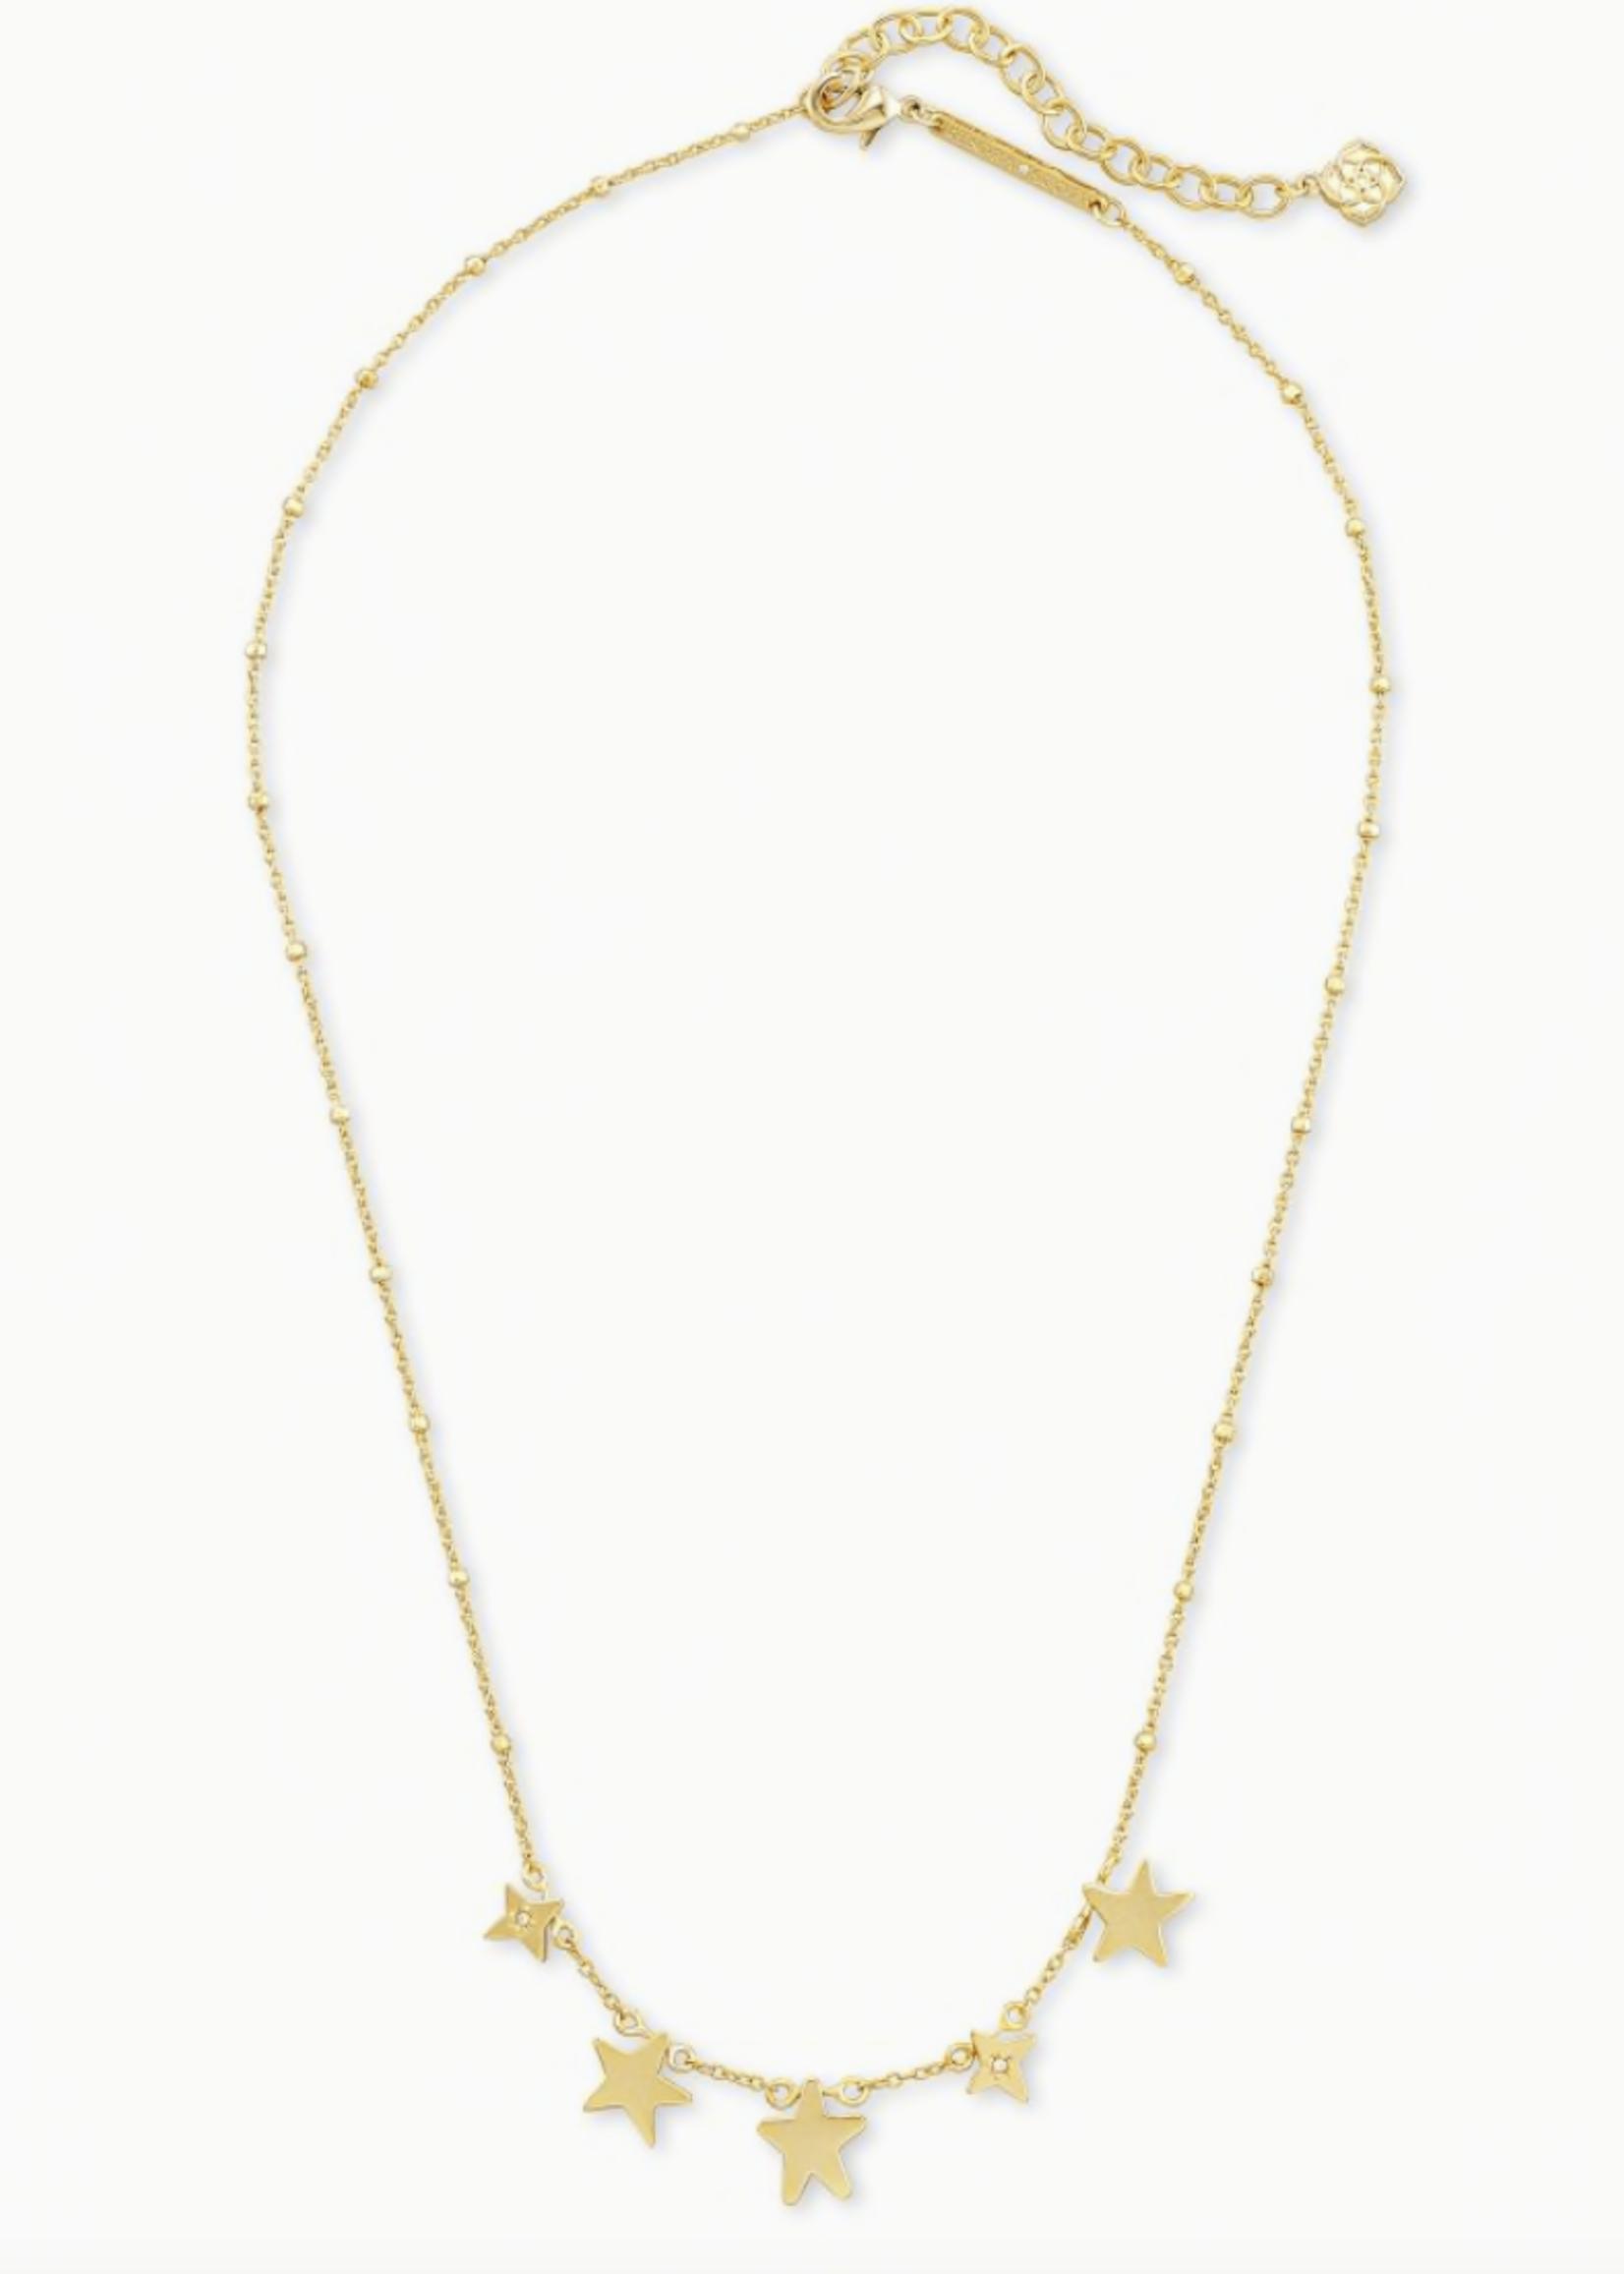 Kendra Scott Kendra Scott Jae Star Choker Necklace Gold